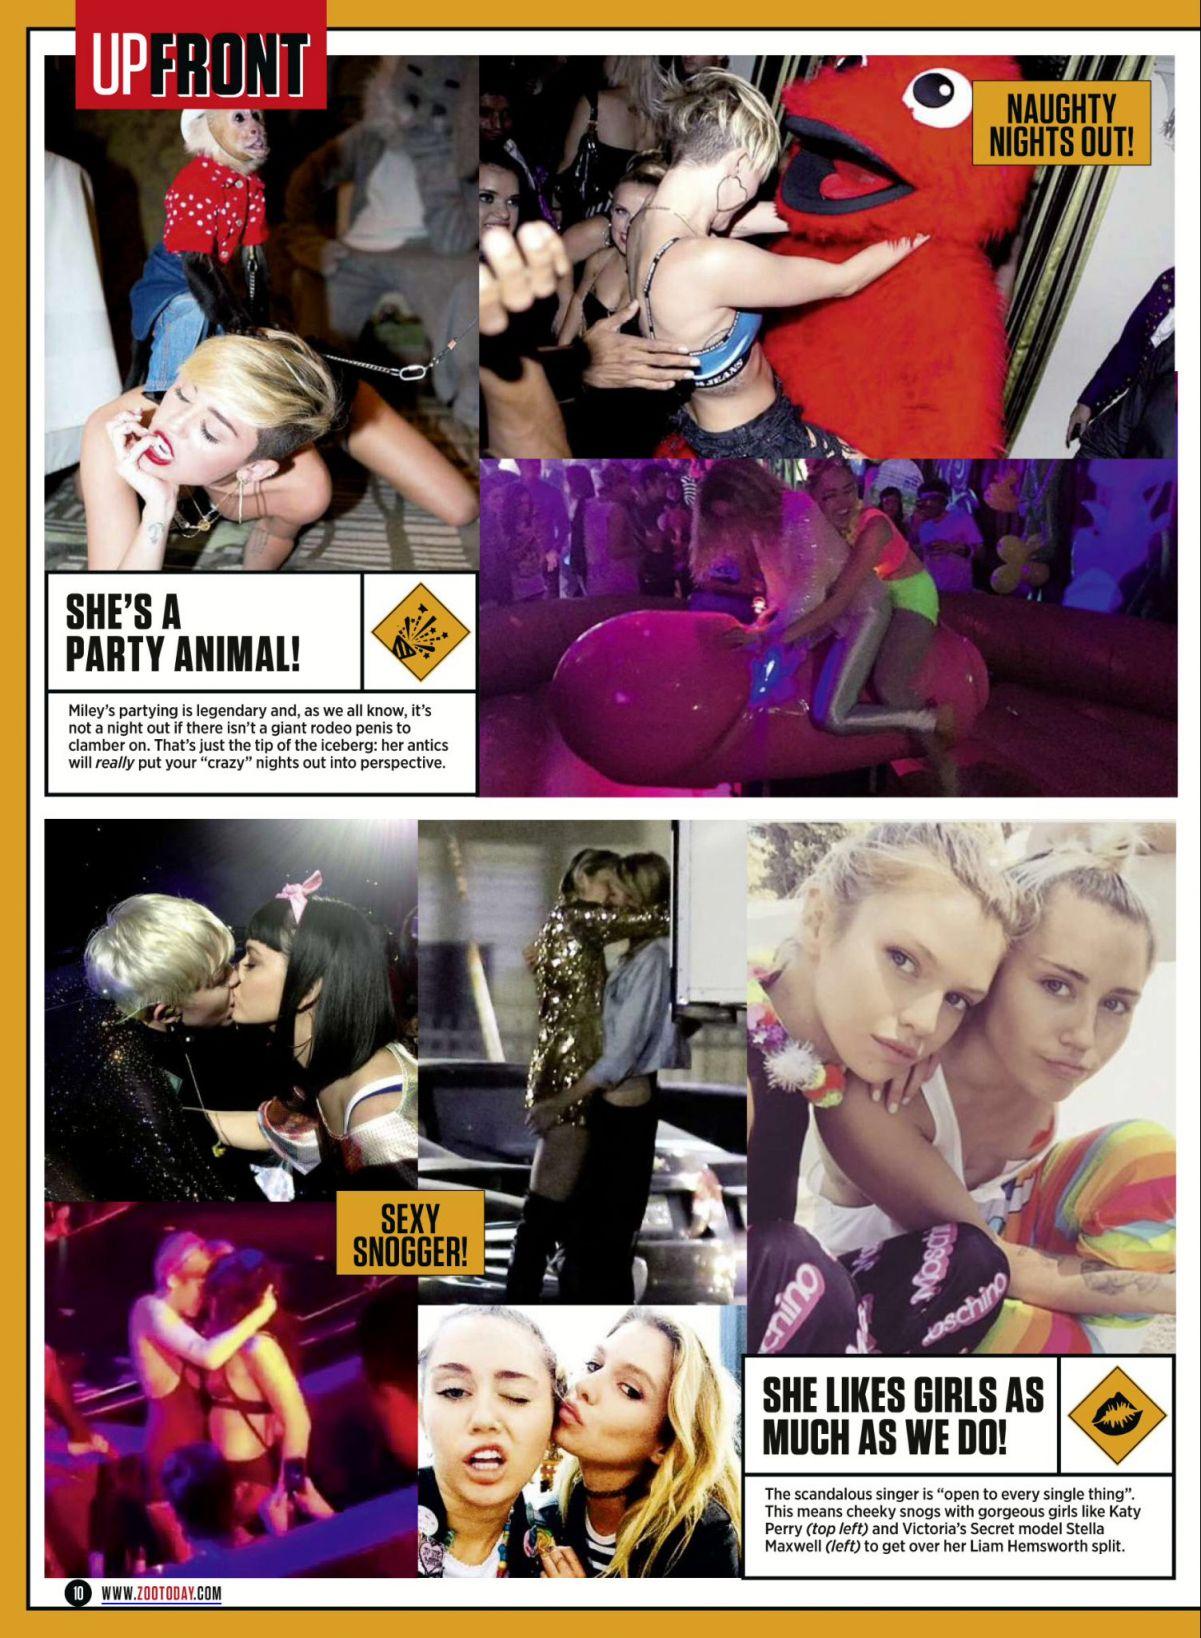 Sexy pics of Miley Cyrus Sexy